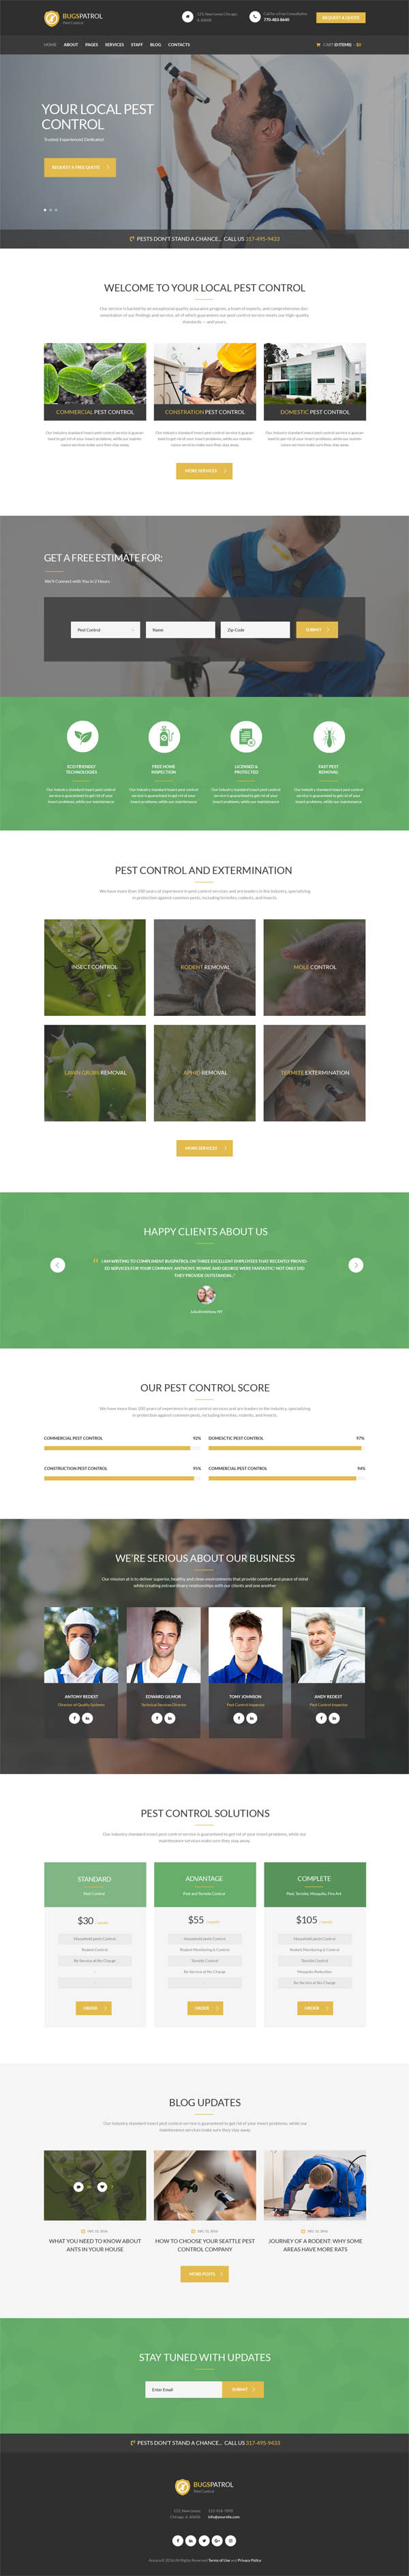 BugsPatrol – Pest Control Services WP Theme